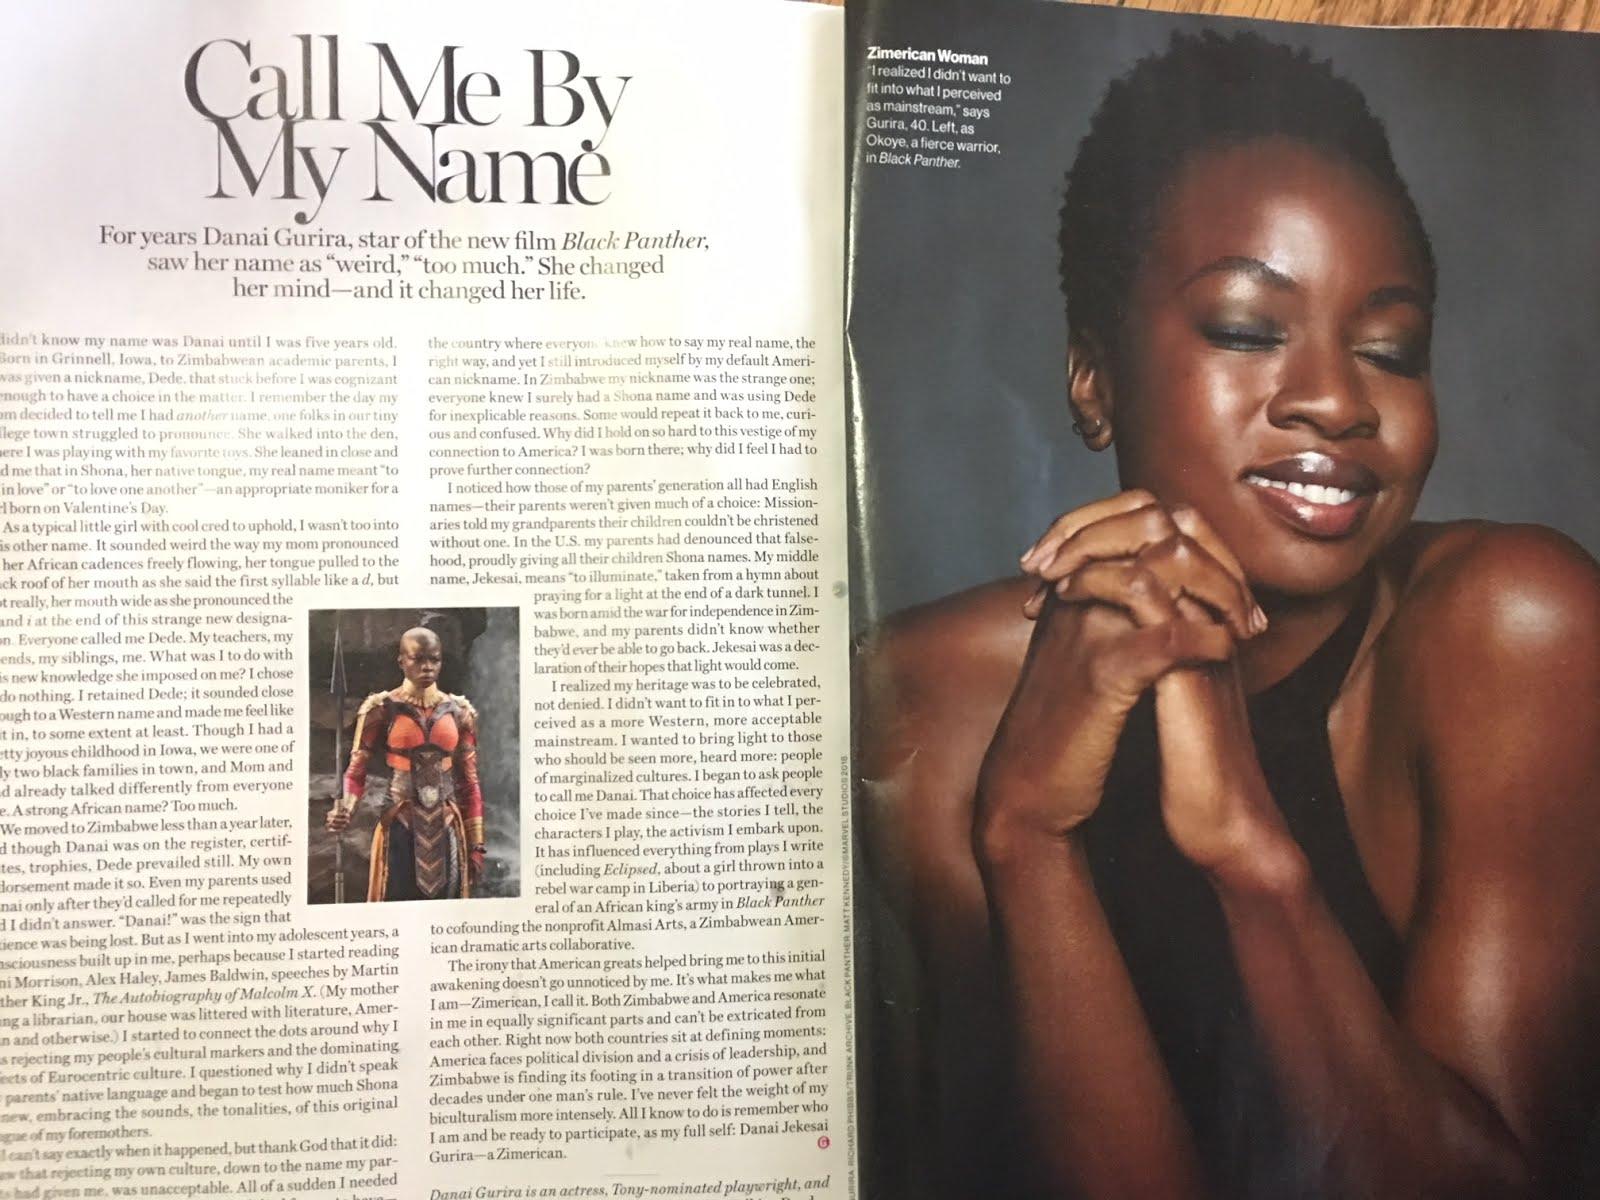 Black Panther's Danai Gurira on being a Proud Zimerican